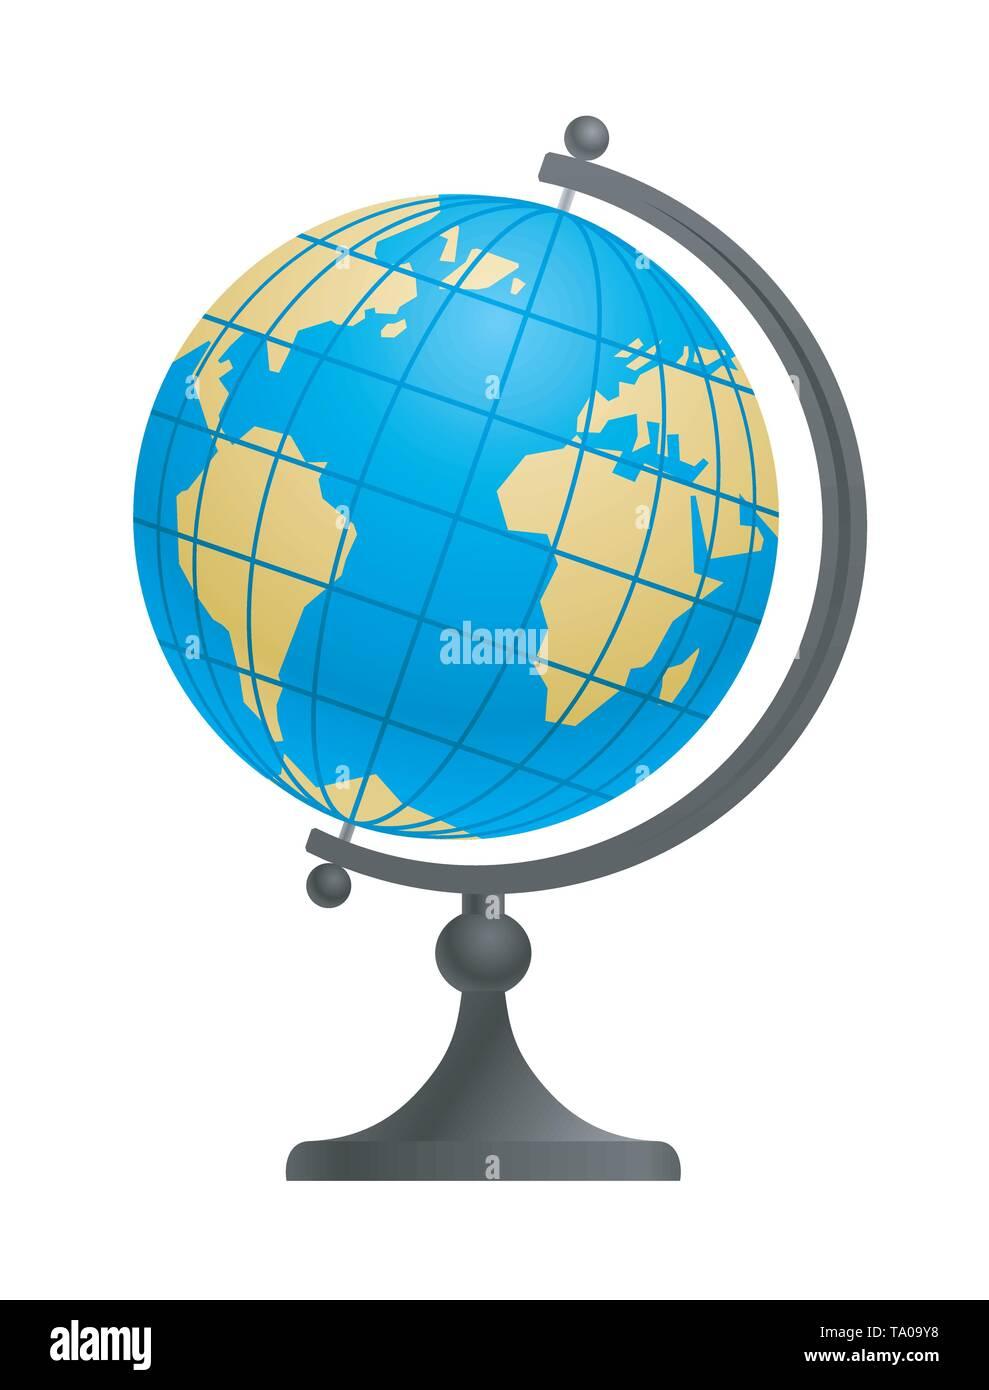 School Globe - Stock Image